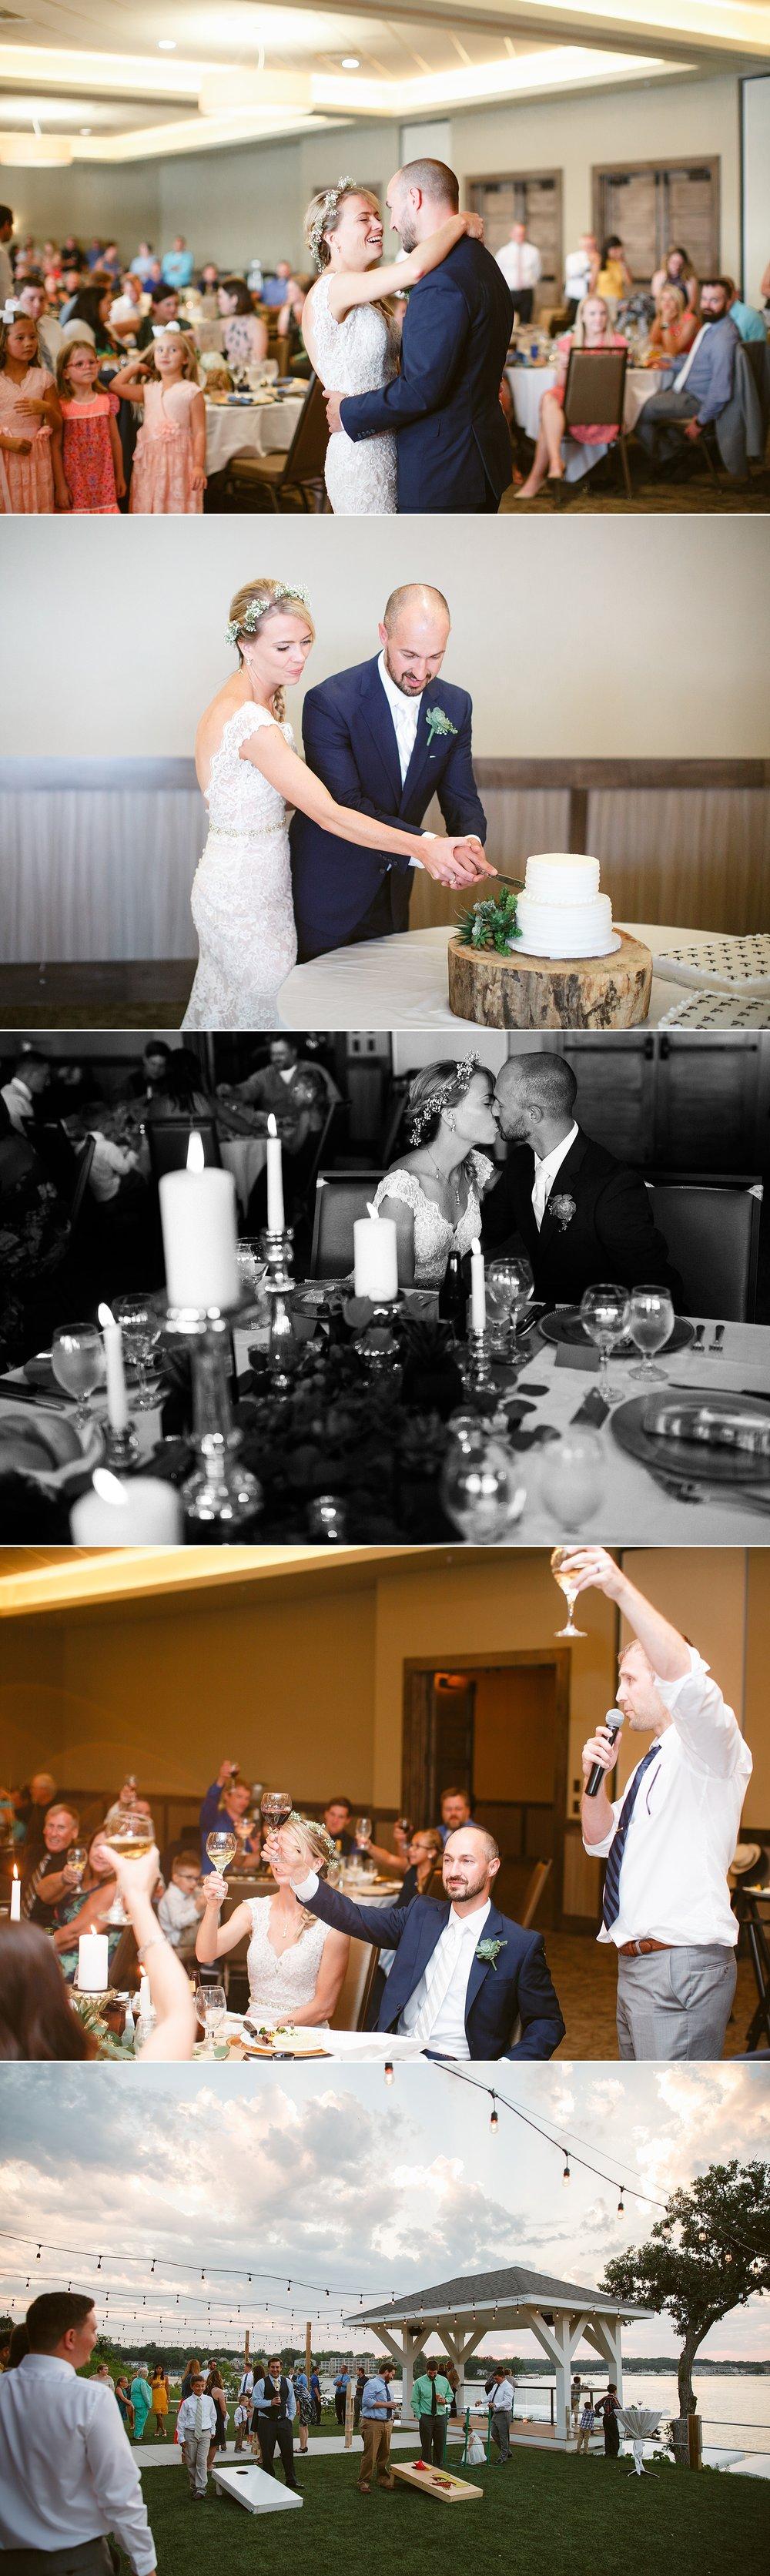 Midwest fine art wedding Des Moines Fall Wedding photographer_0692.jpg